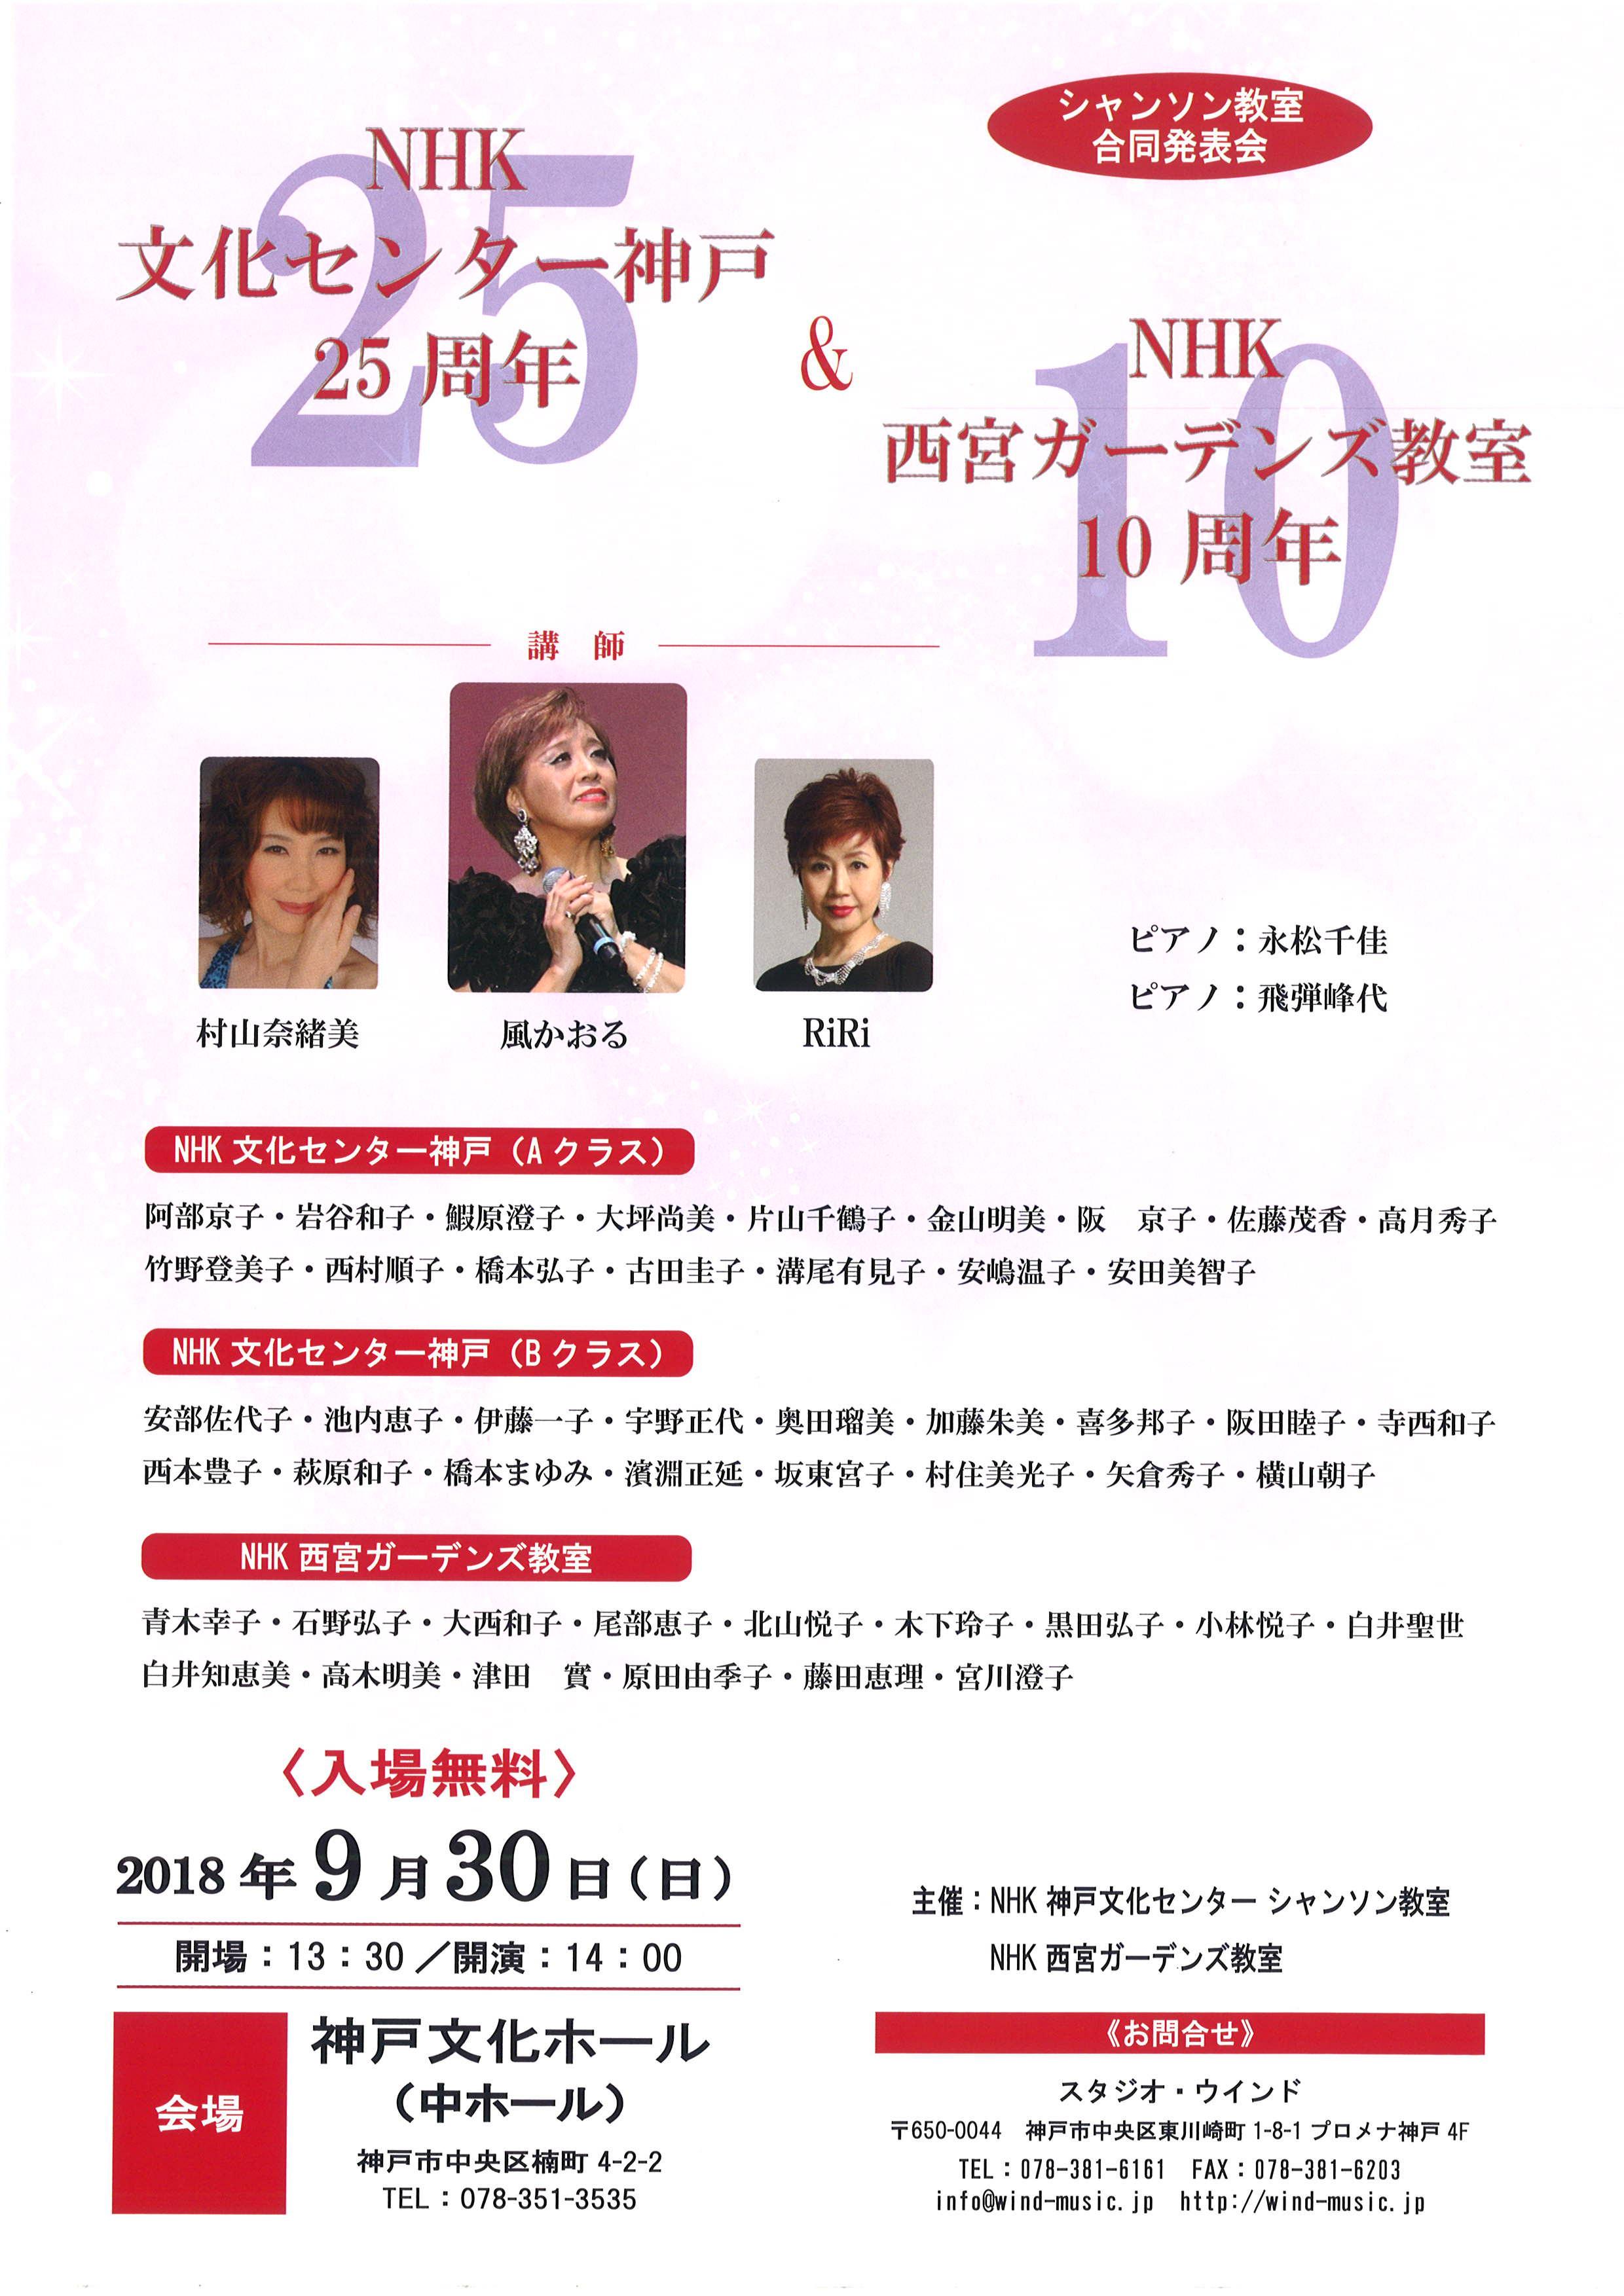 NHKシャンソン教室 合同発表会.jpg